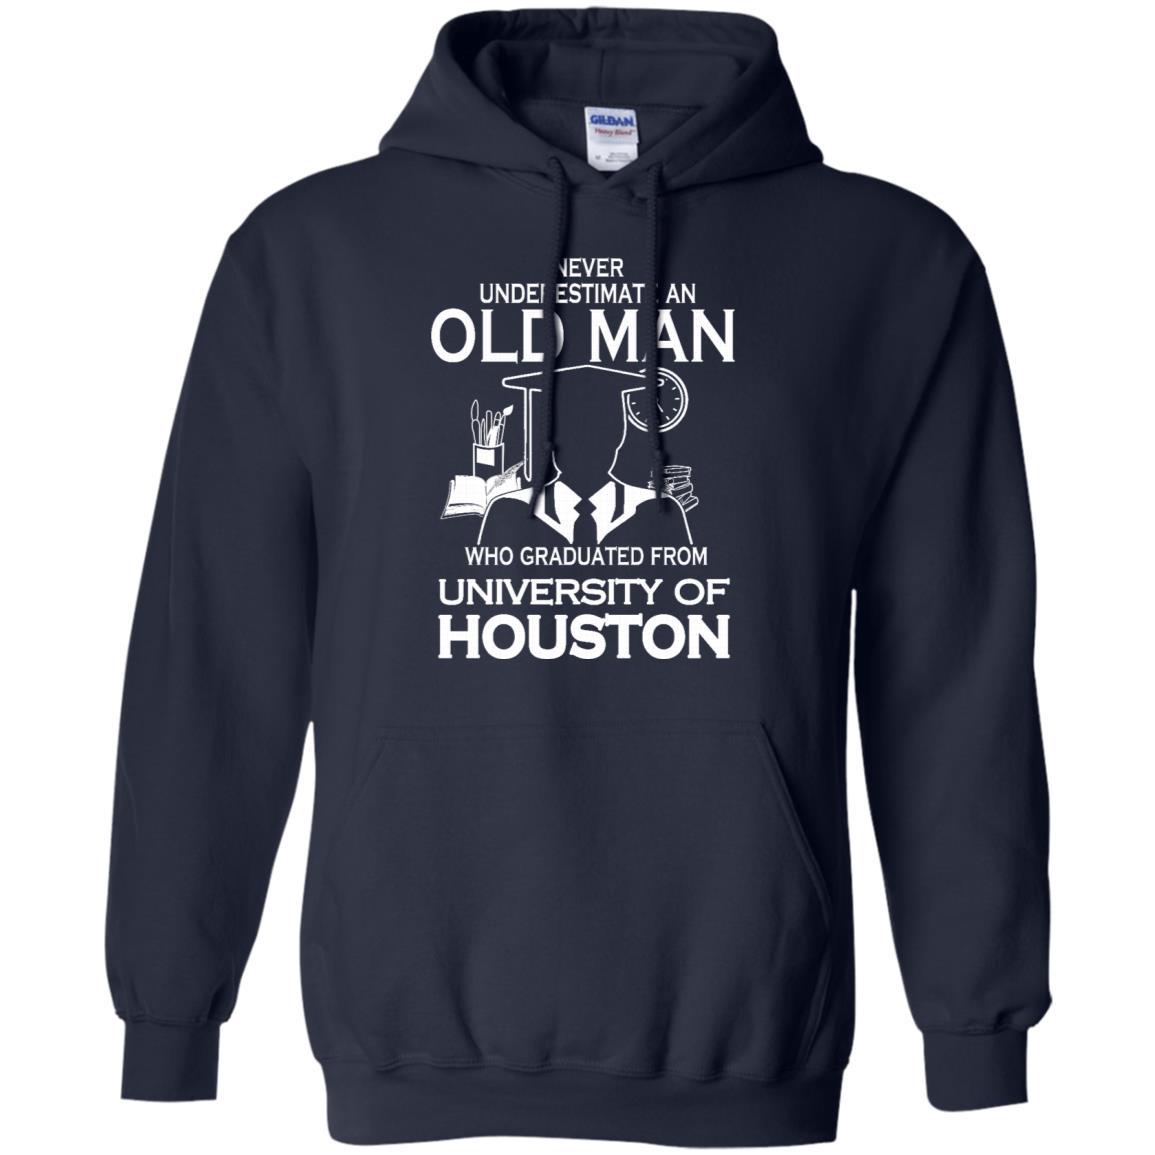 6e97f28b21c University Of Houston Graduate Man T shirts Hoodies, Sweatshirts ...